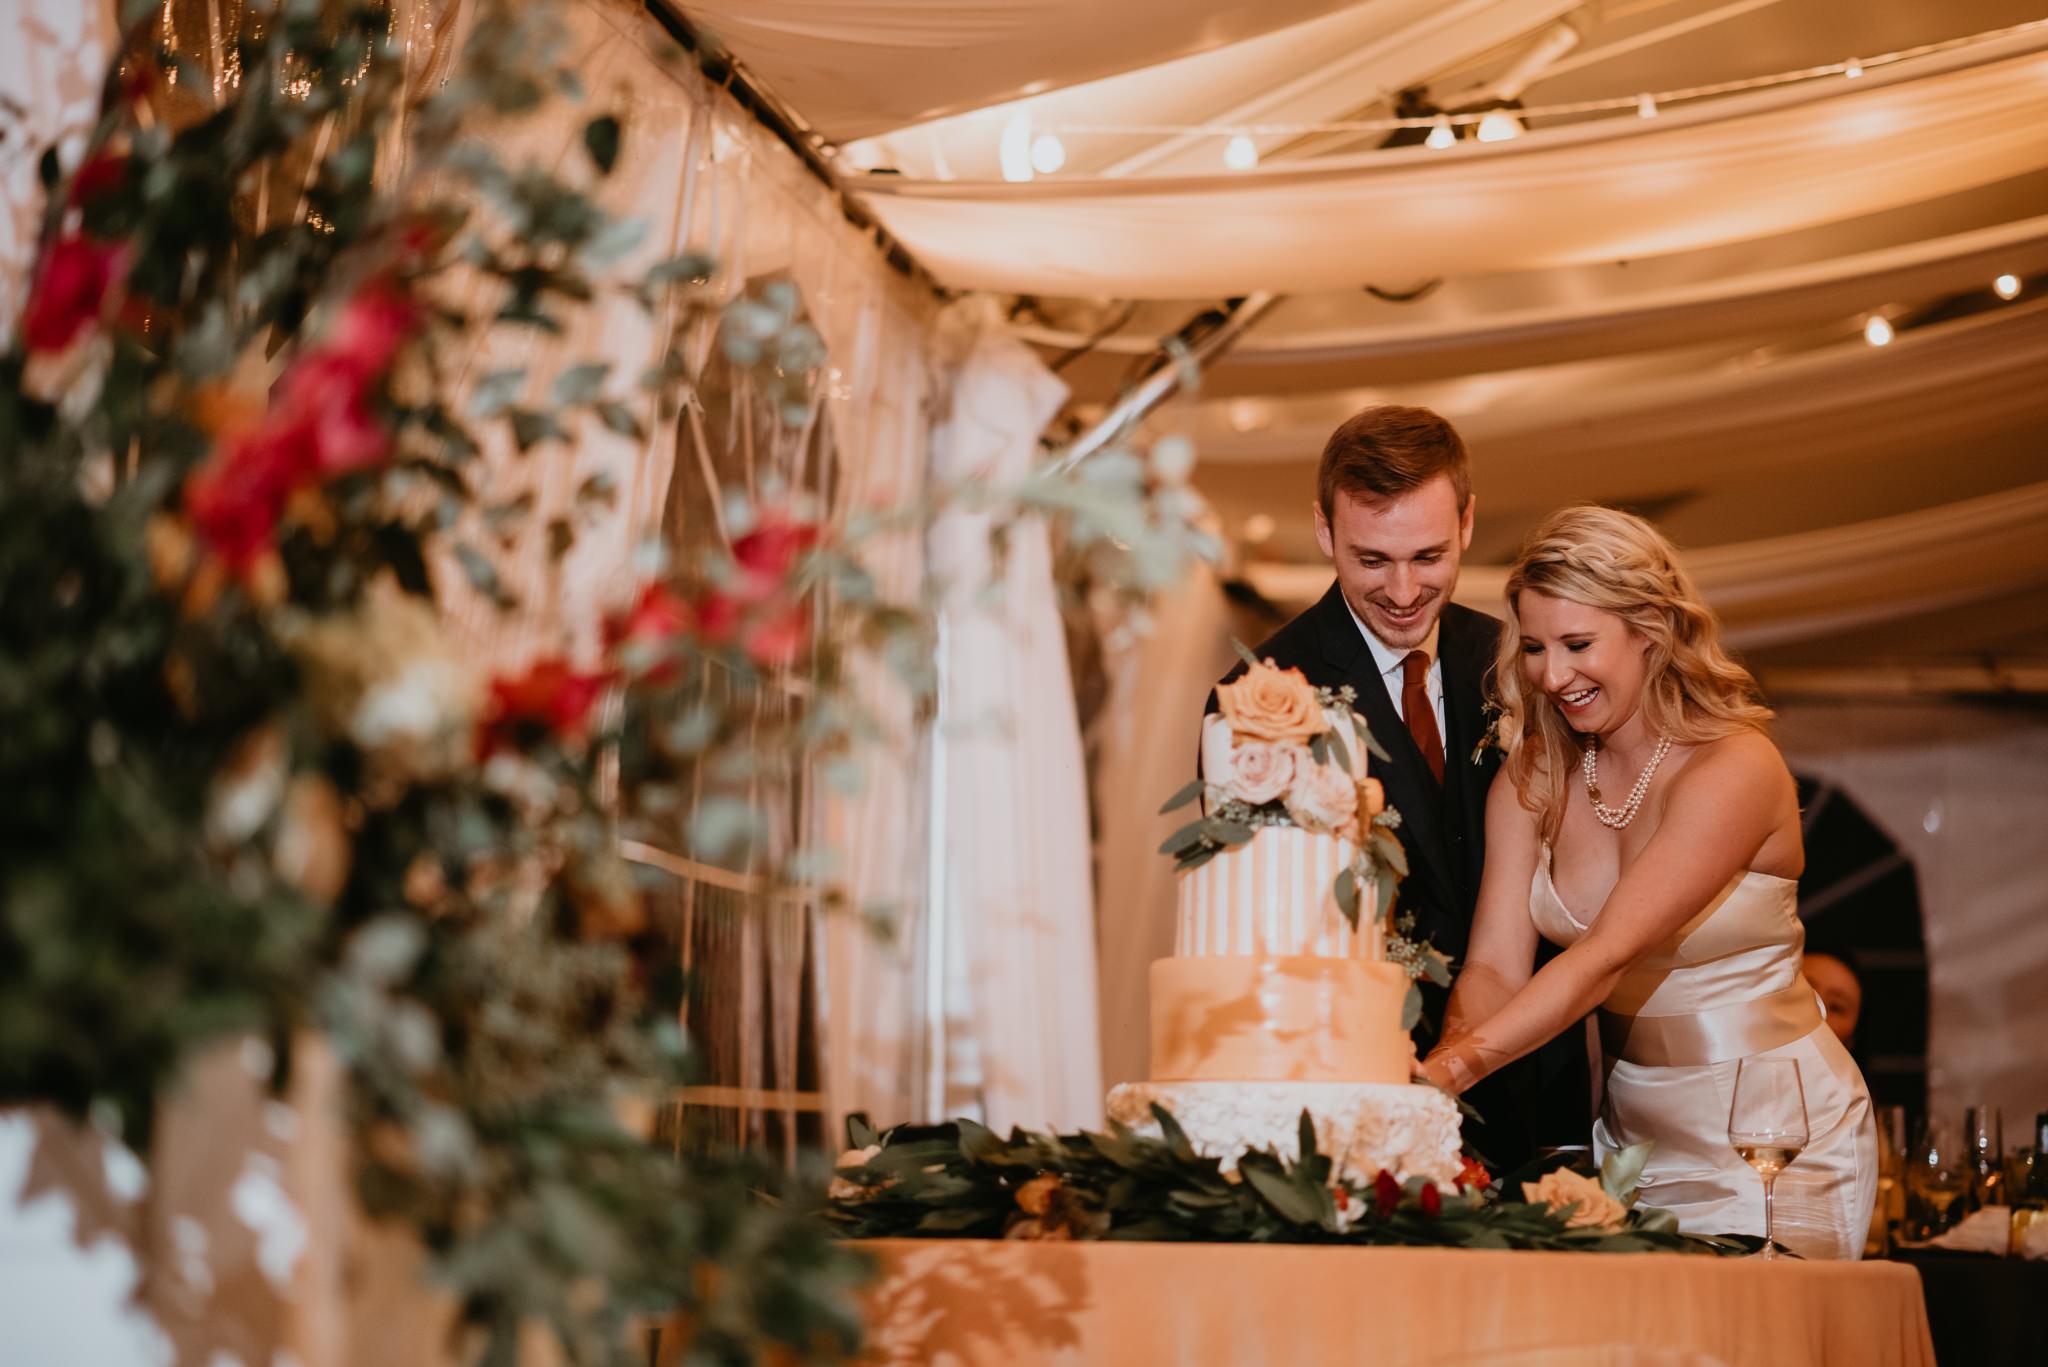 Sundara - Weddings - Virginia - Best Wedding Photographer - Pat Cori Photography-90.jpg